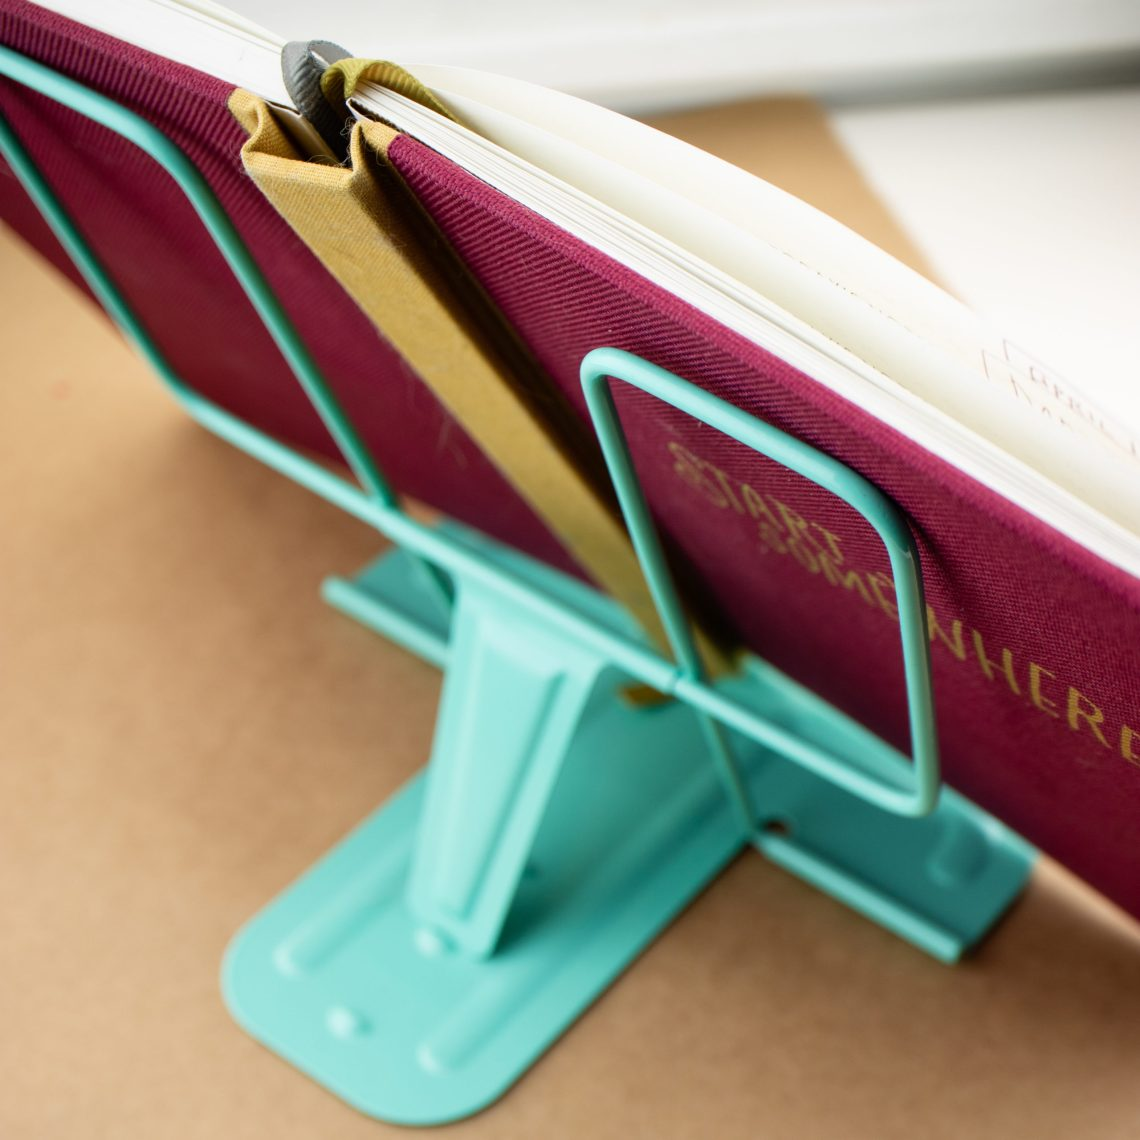 Hightide Metal Book Rest